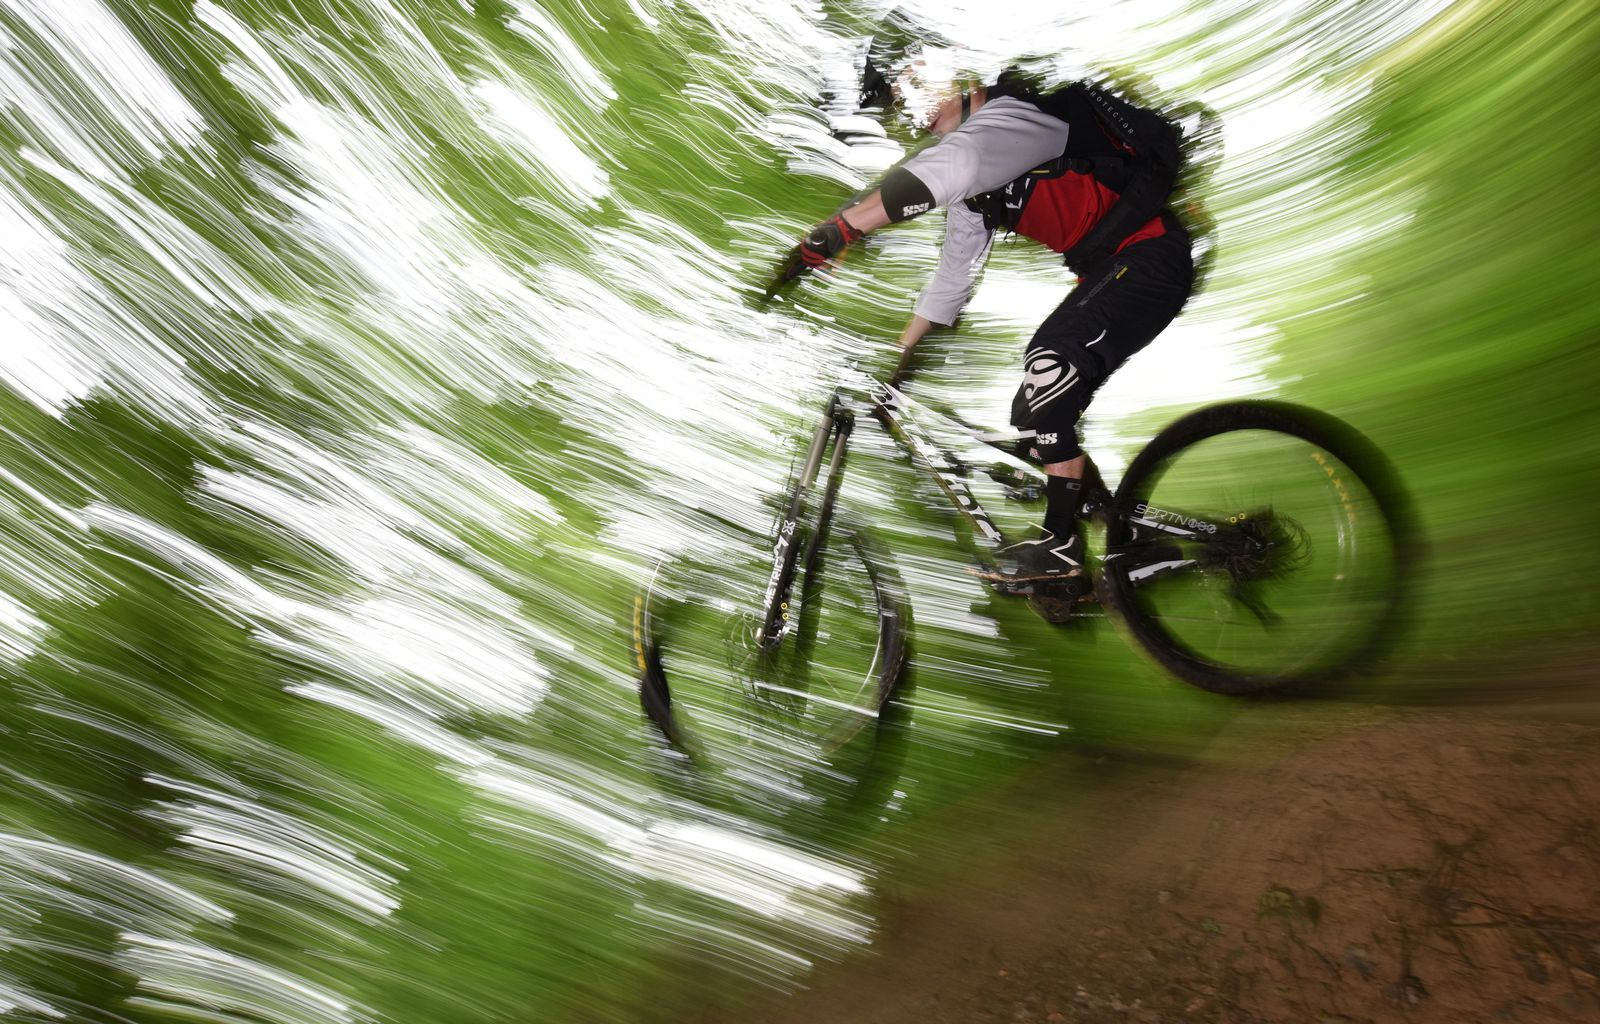 Fahrrad fahren im Wald